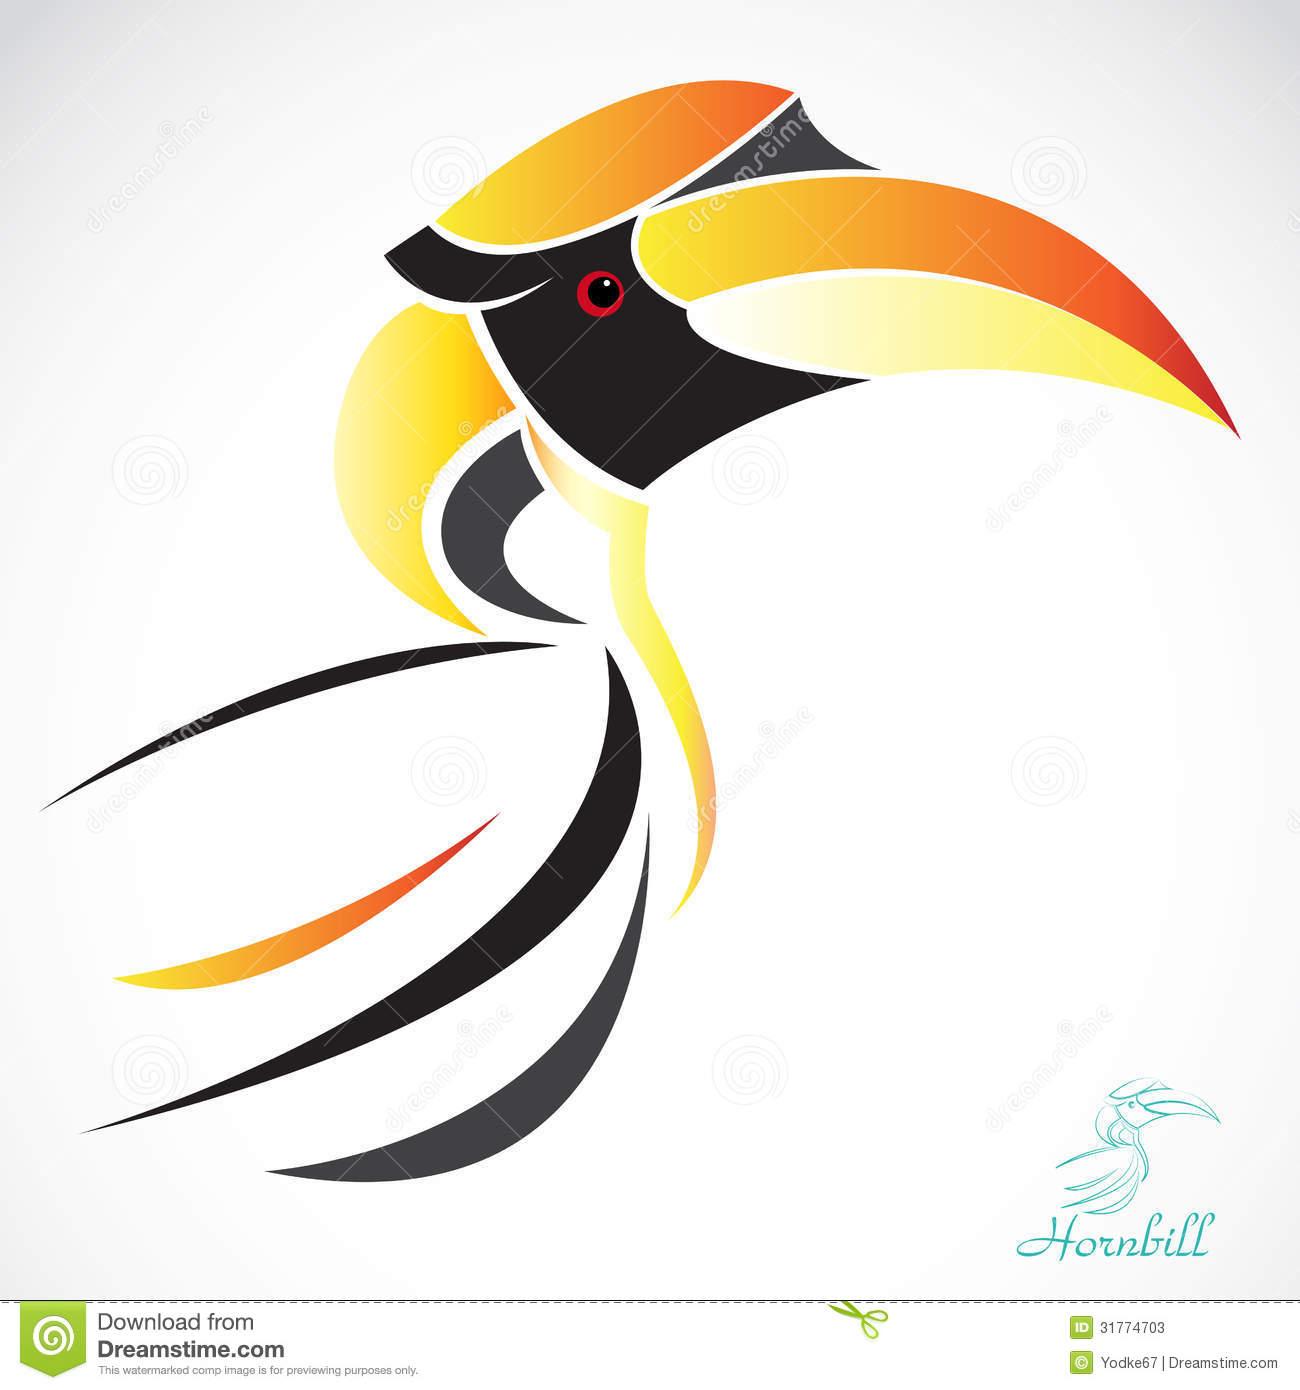 Nice wallpapers Hornbill 1300x1390px